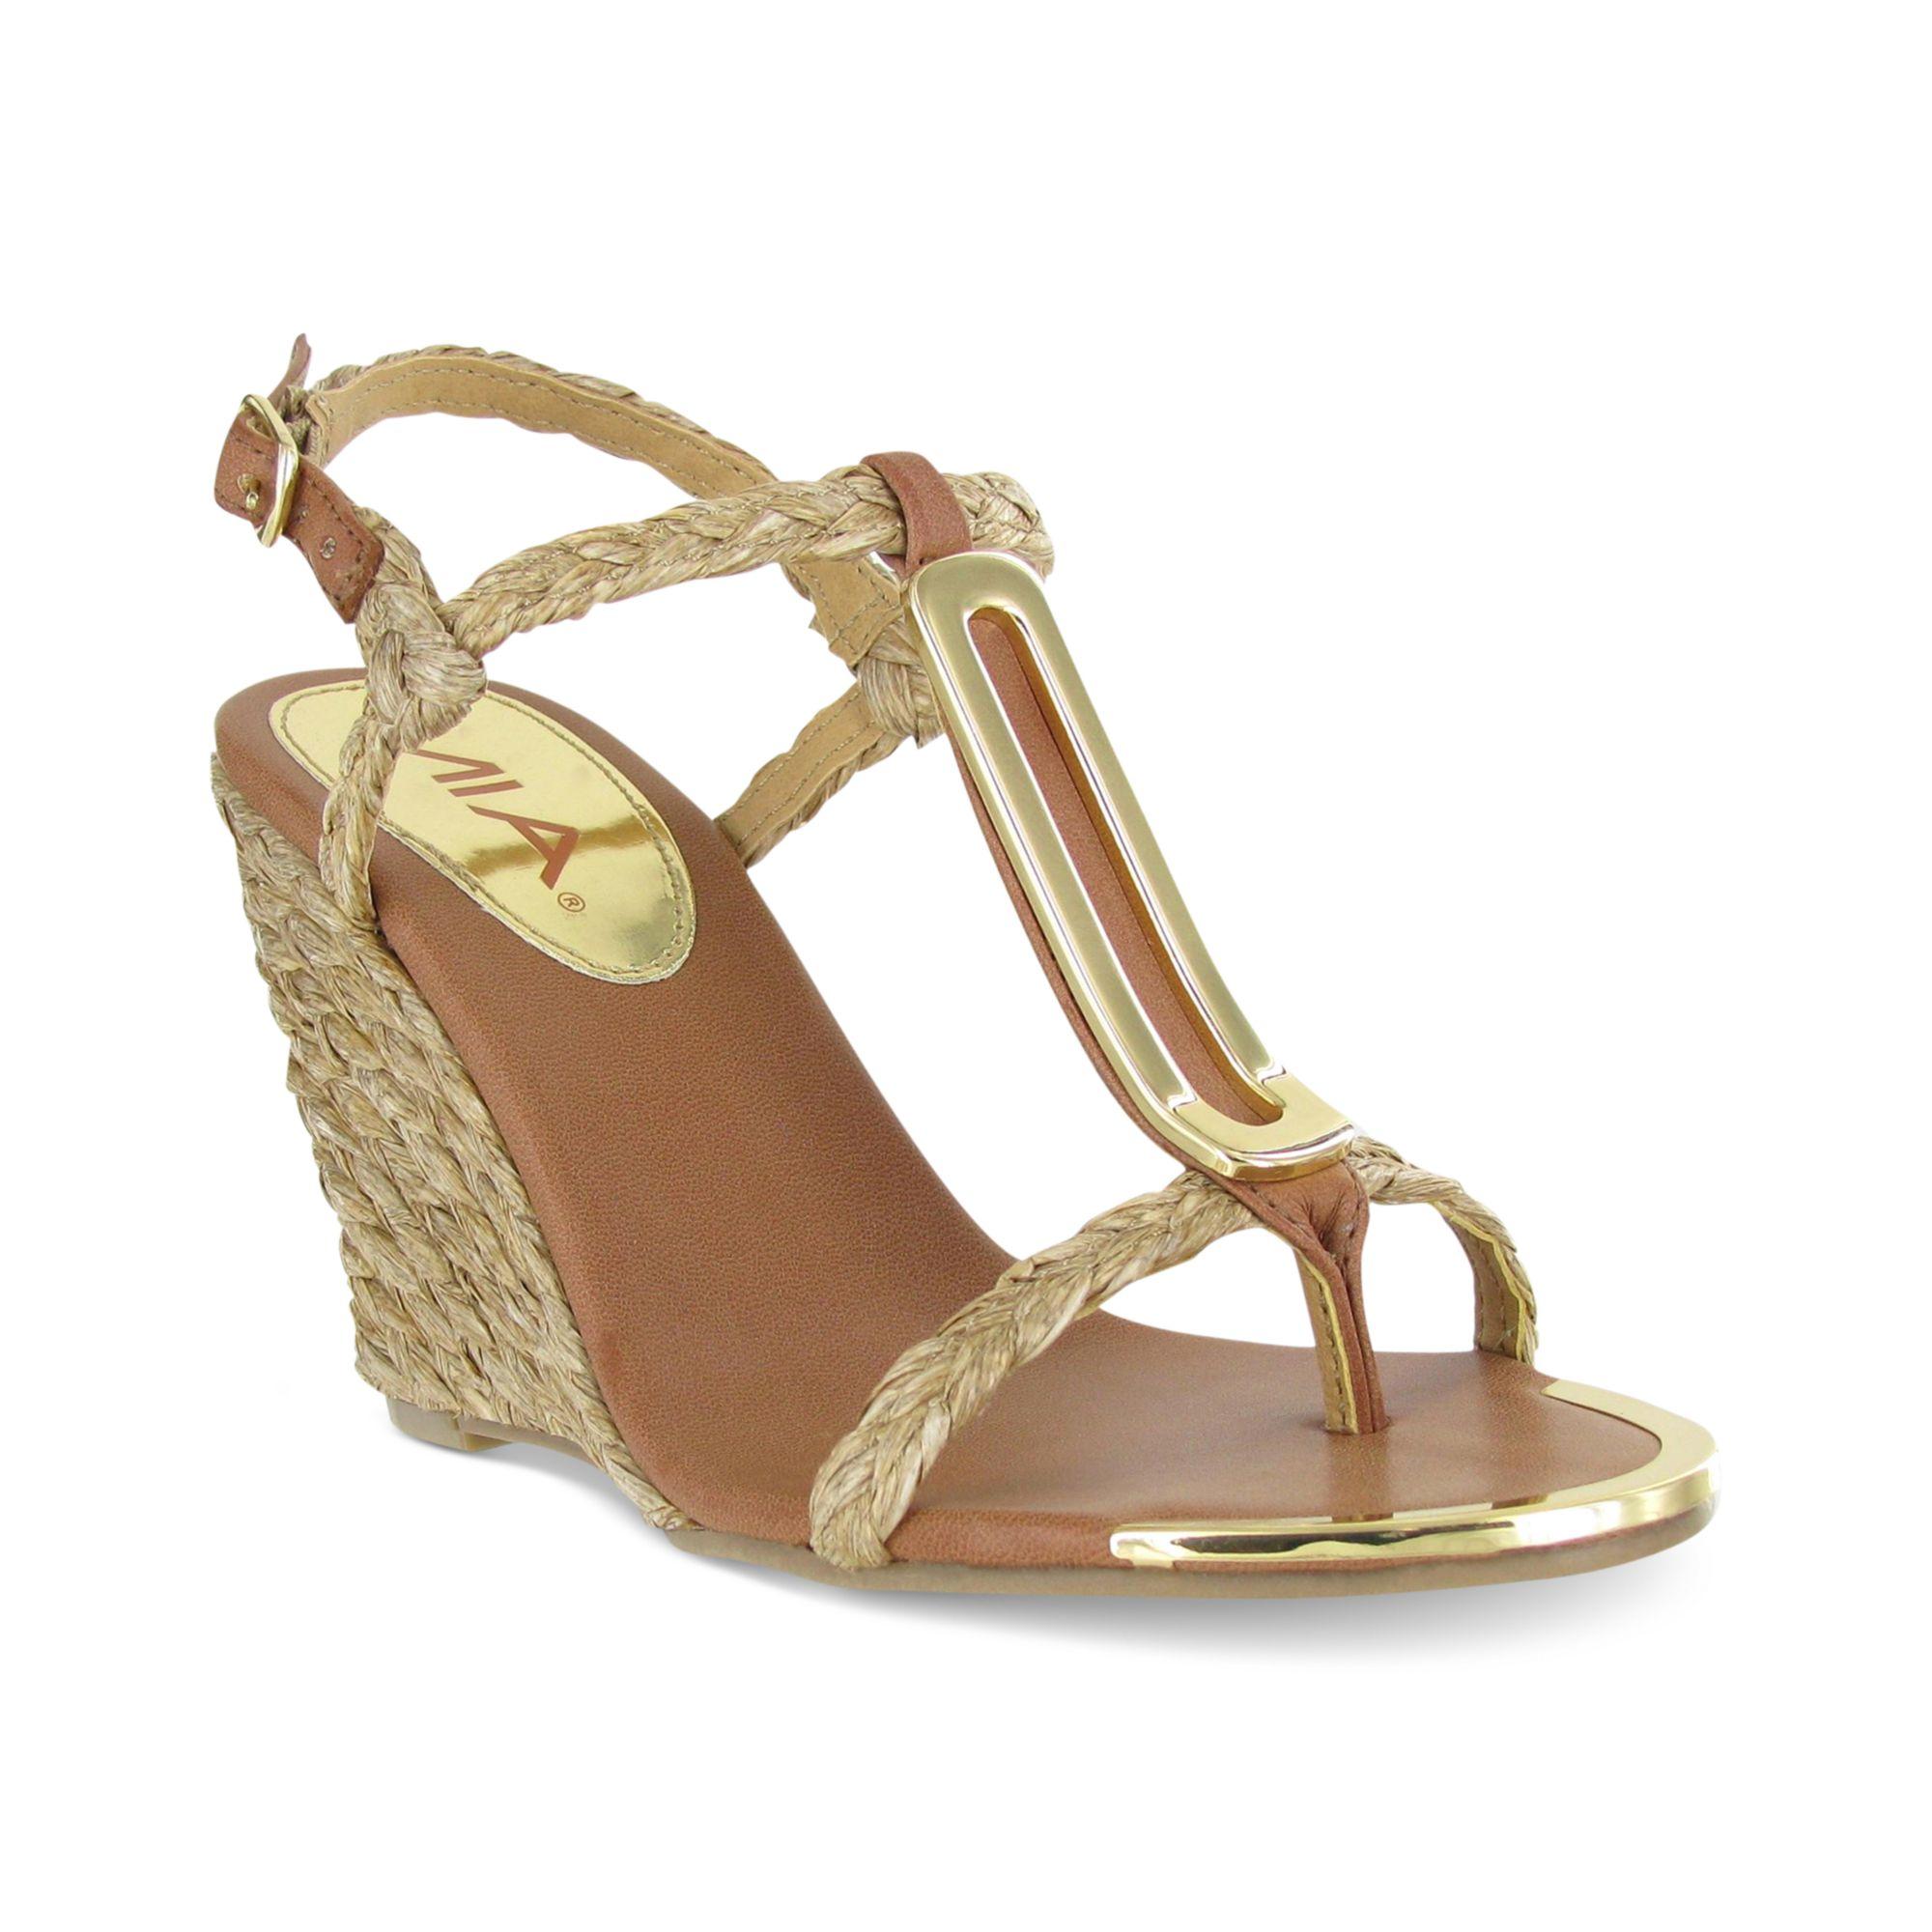 Lyst Tiffany Sandals Natural In Mia Wedge ErCxWBdoQe